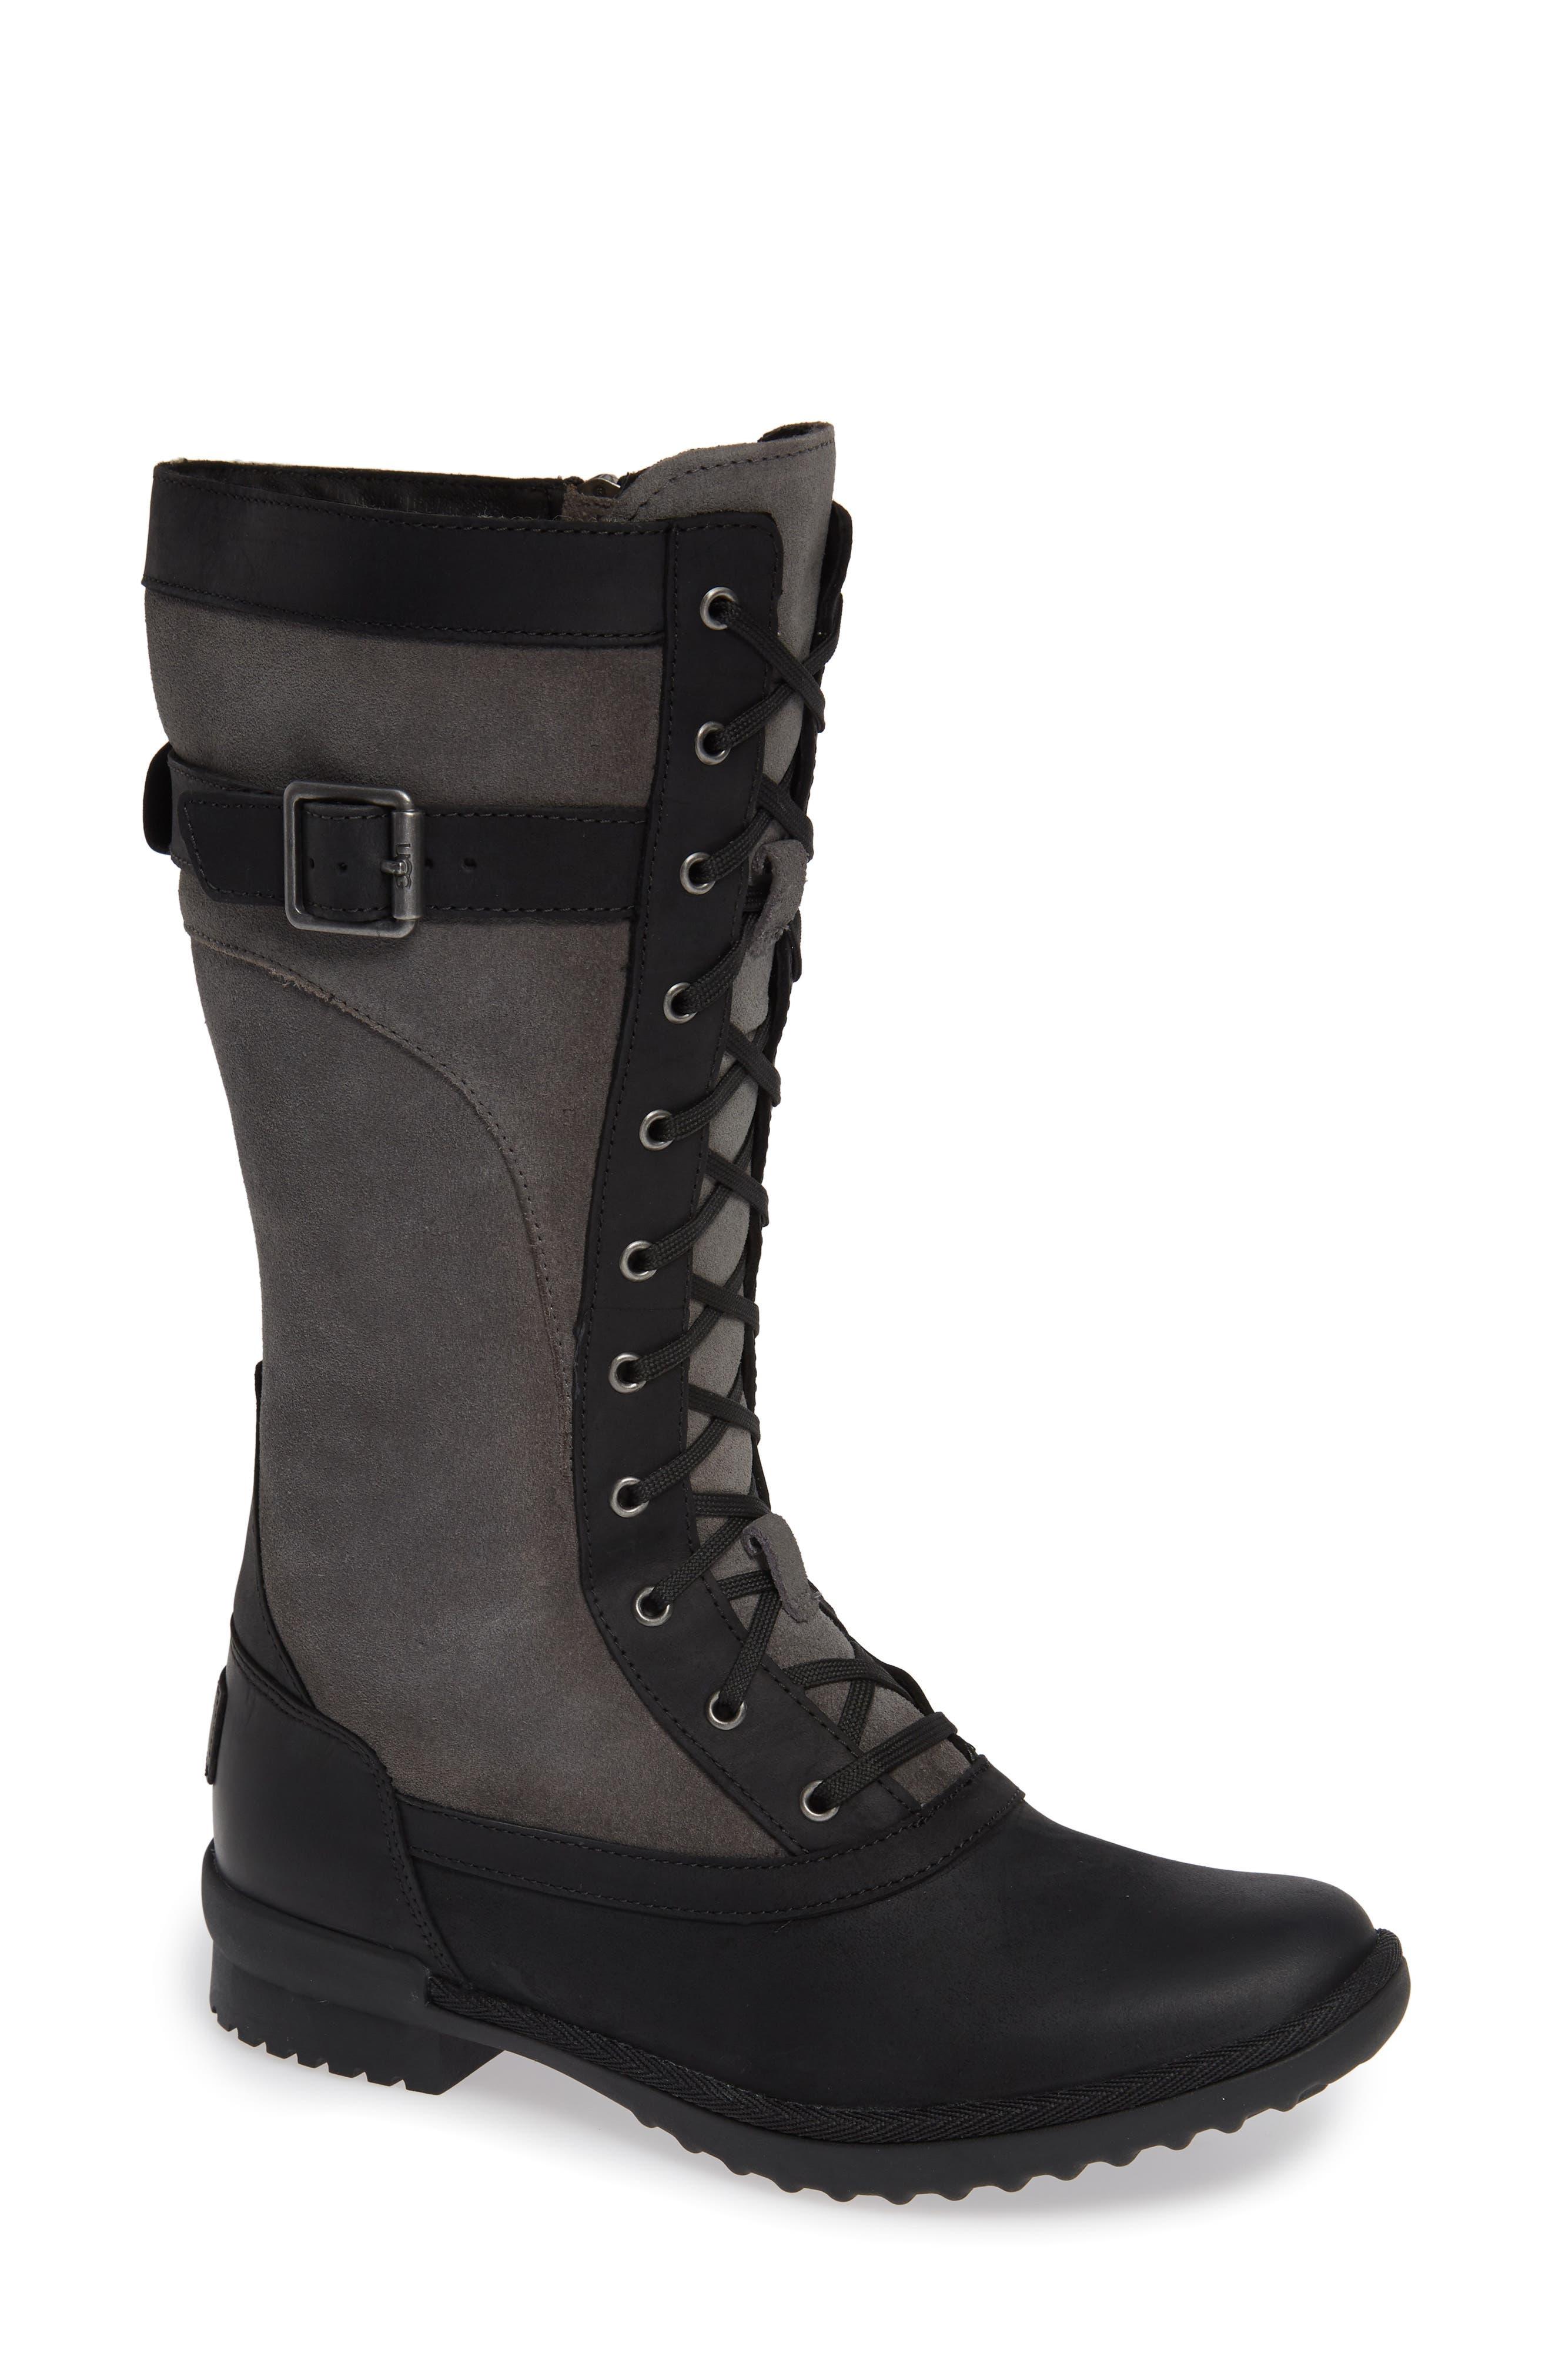 Ugg Brystl Waterproof Insulated Boot, Black